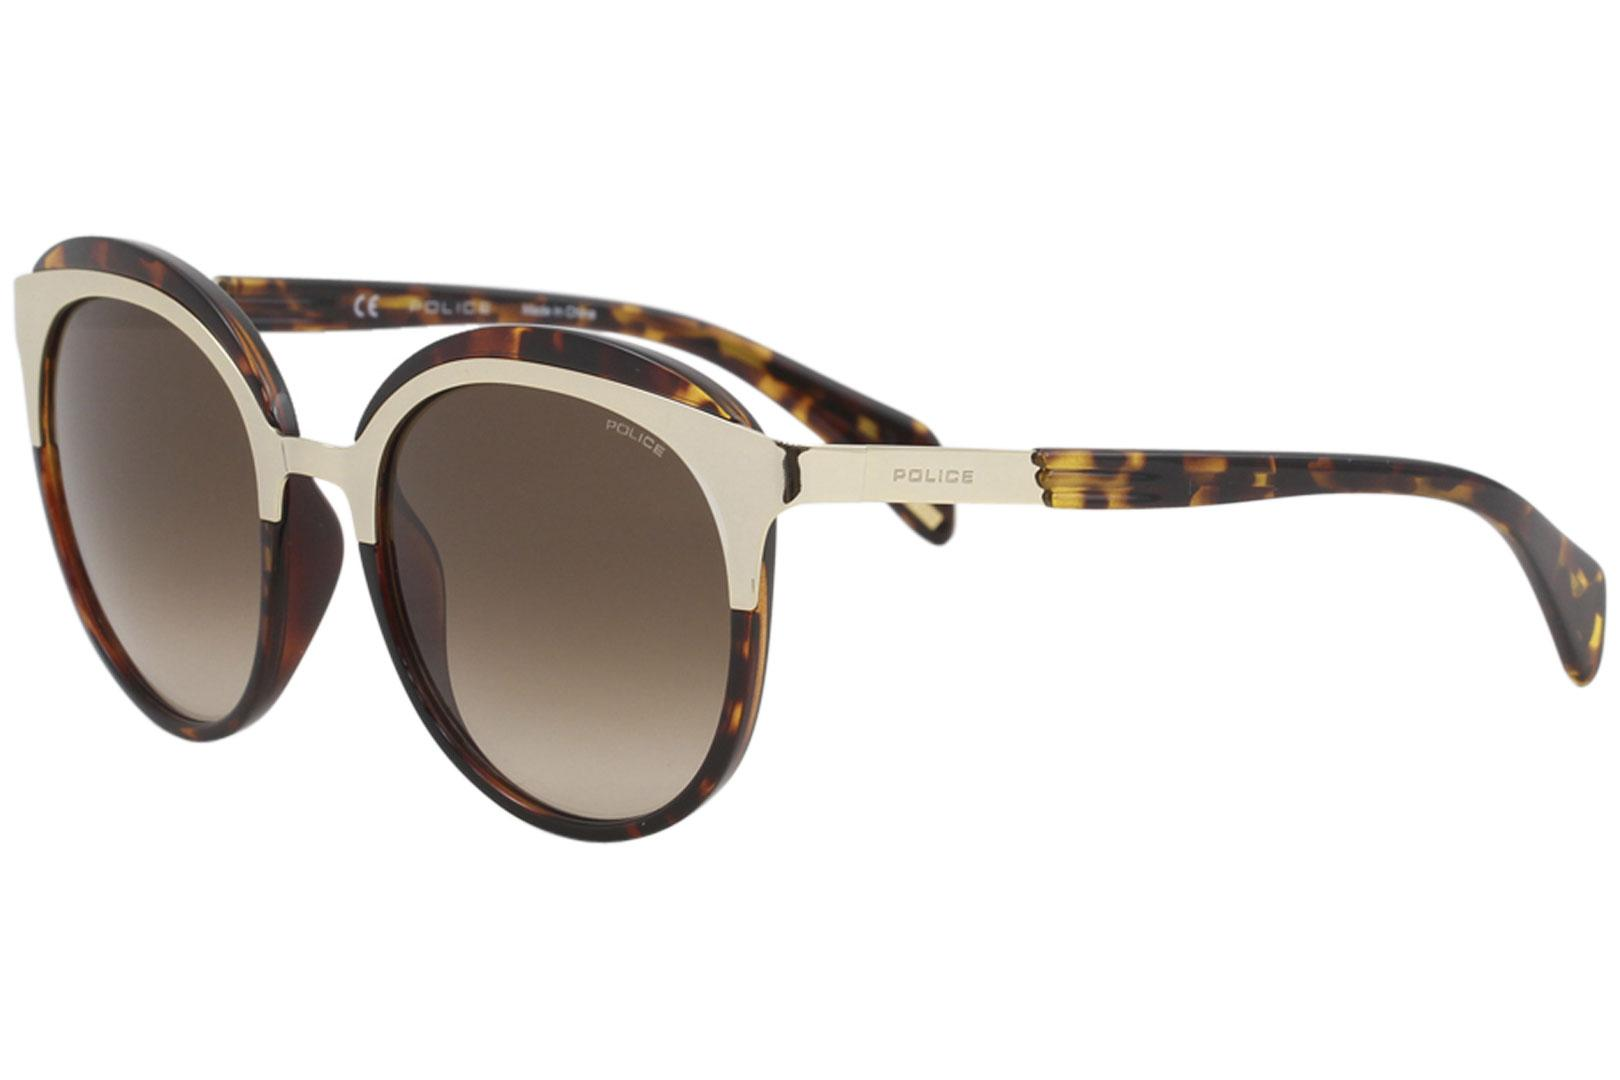 1fd39cfb8 Police Women's SPL499 SPL/499 Fashion Cat Eye Sunglasses